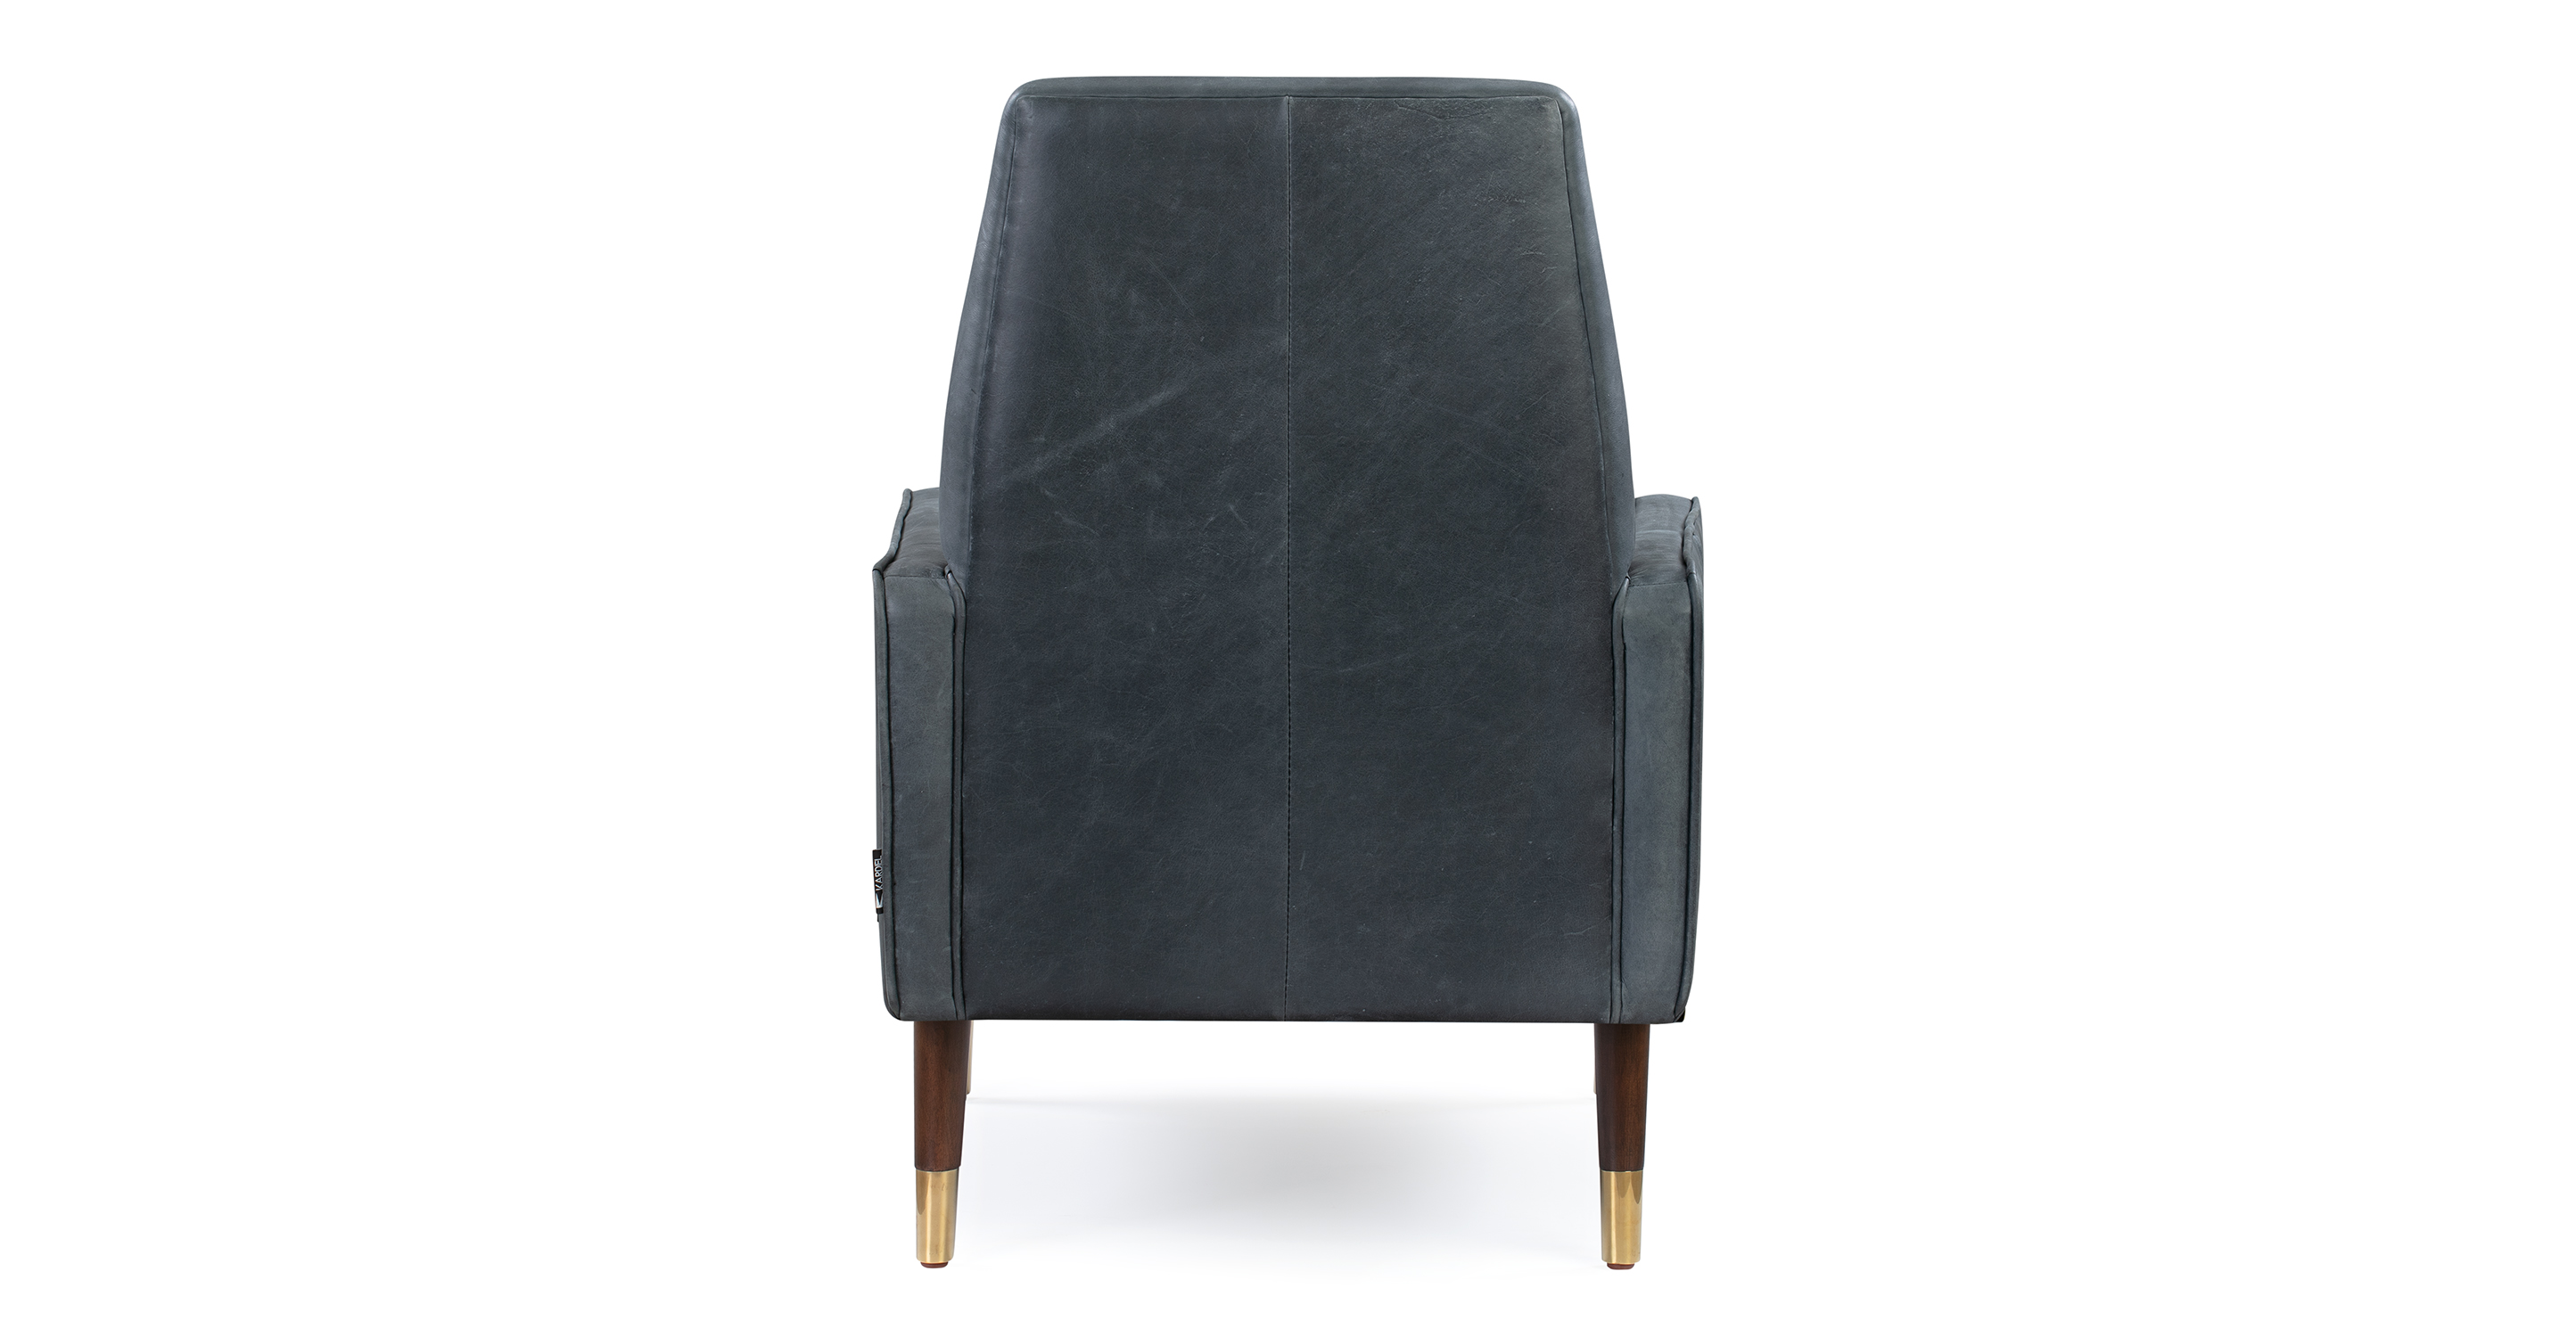 "Draper 27"" Leather Chair, Black Top Grain Full Aniline"